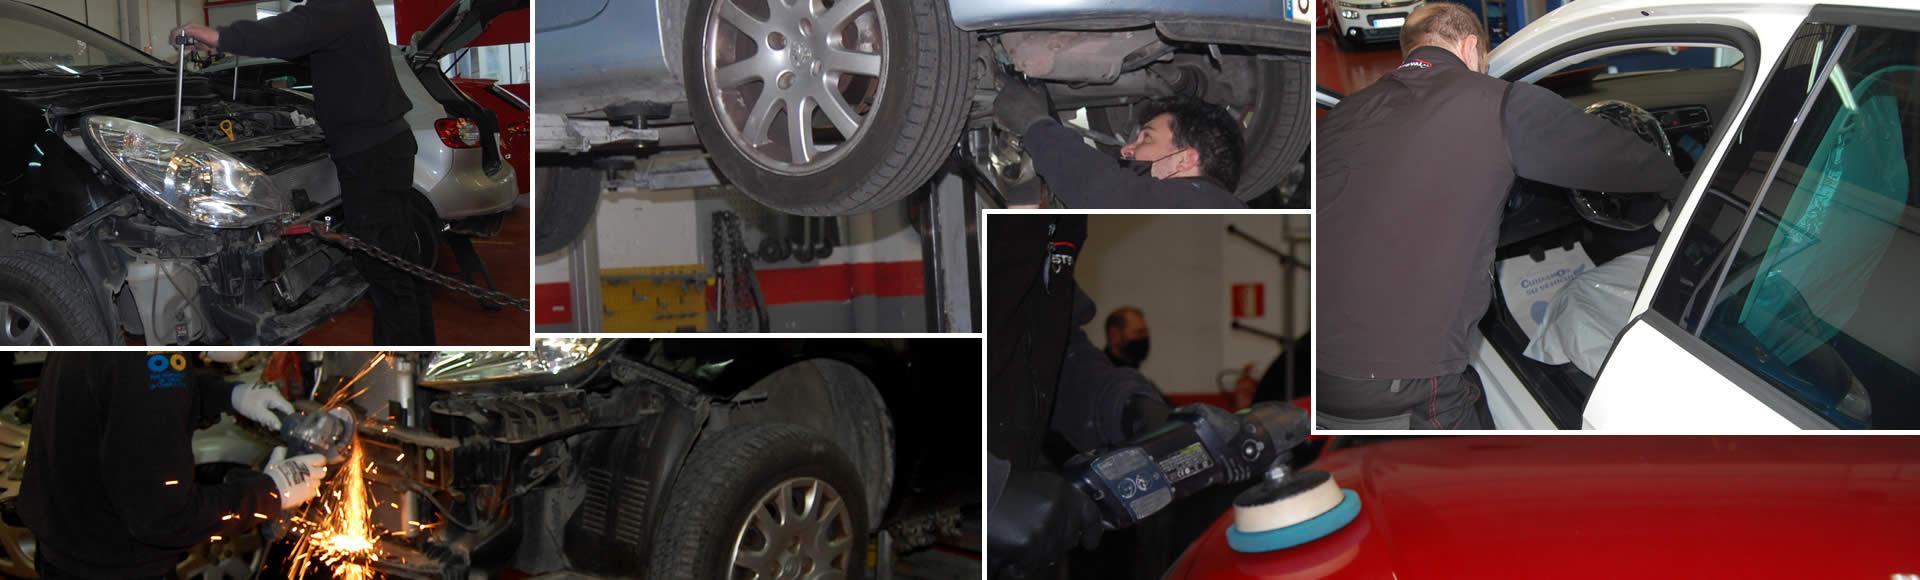 automoviles-esteval-mecanica-valencia